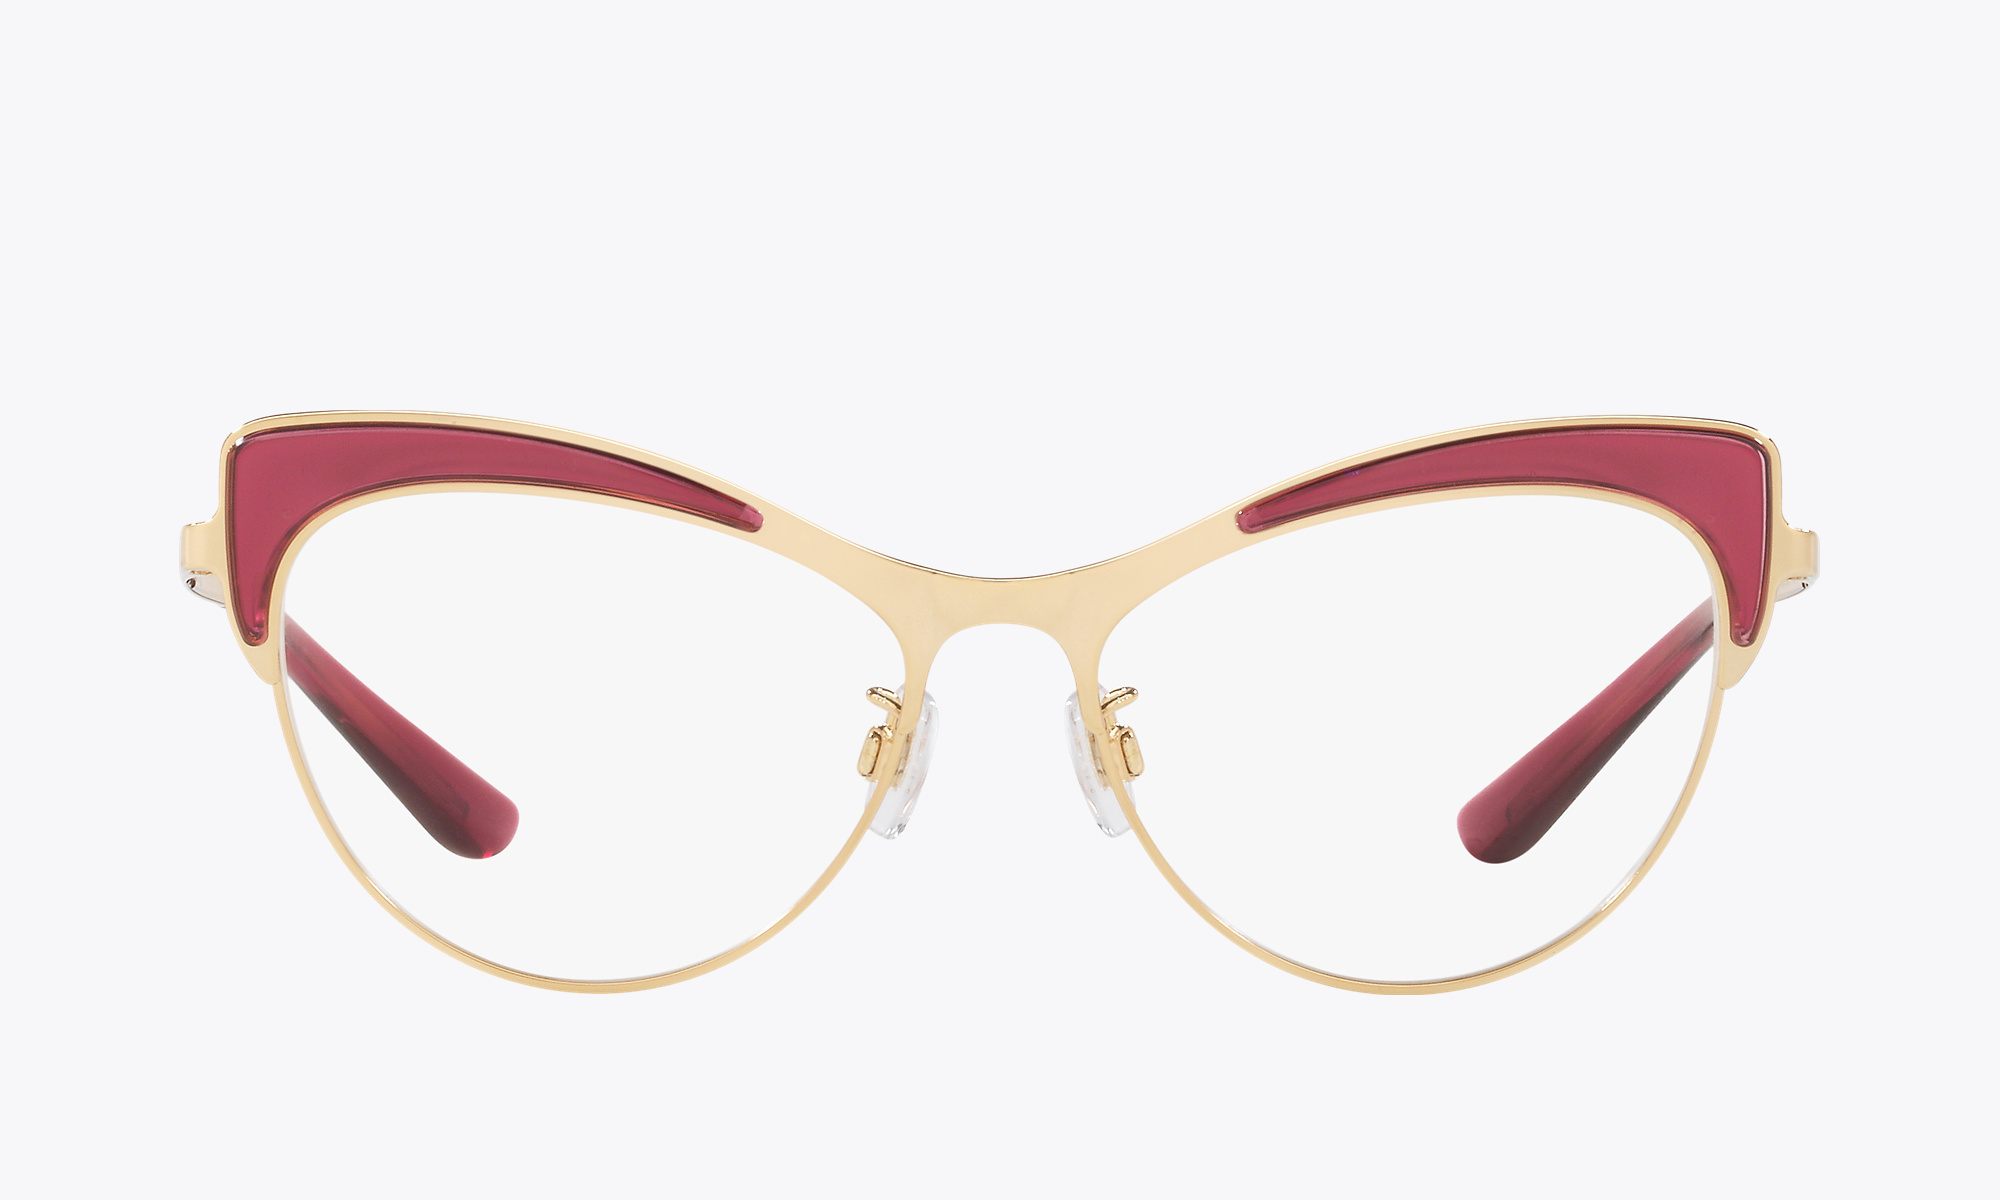 Image of Dolce & Gabbana DG1308 color Gold